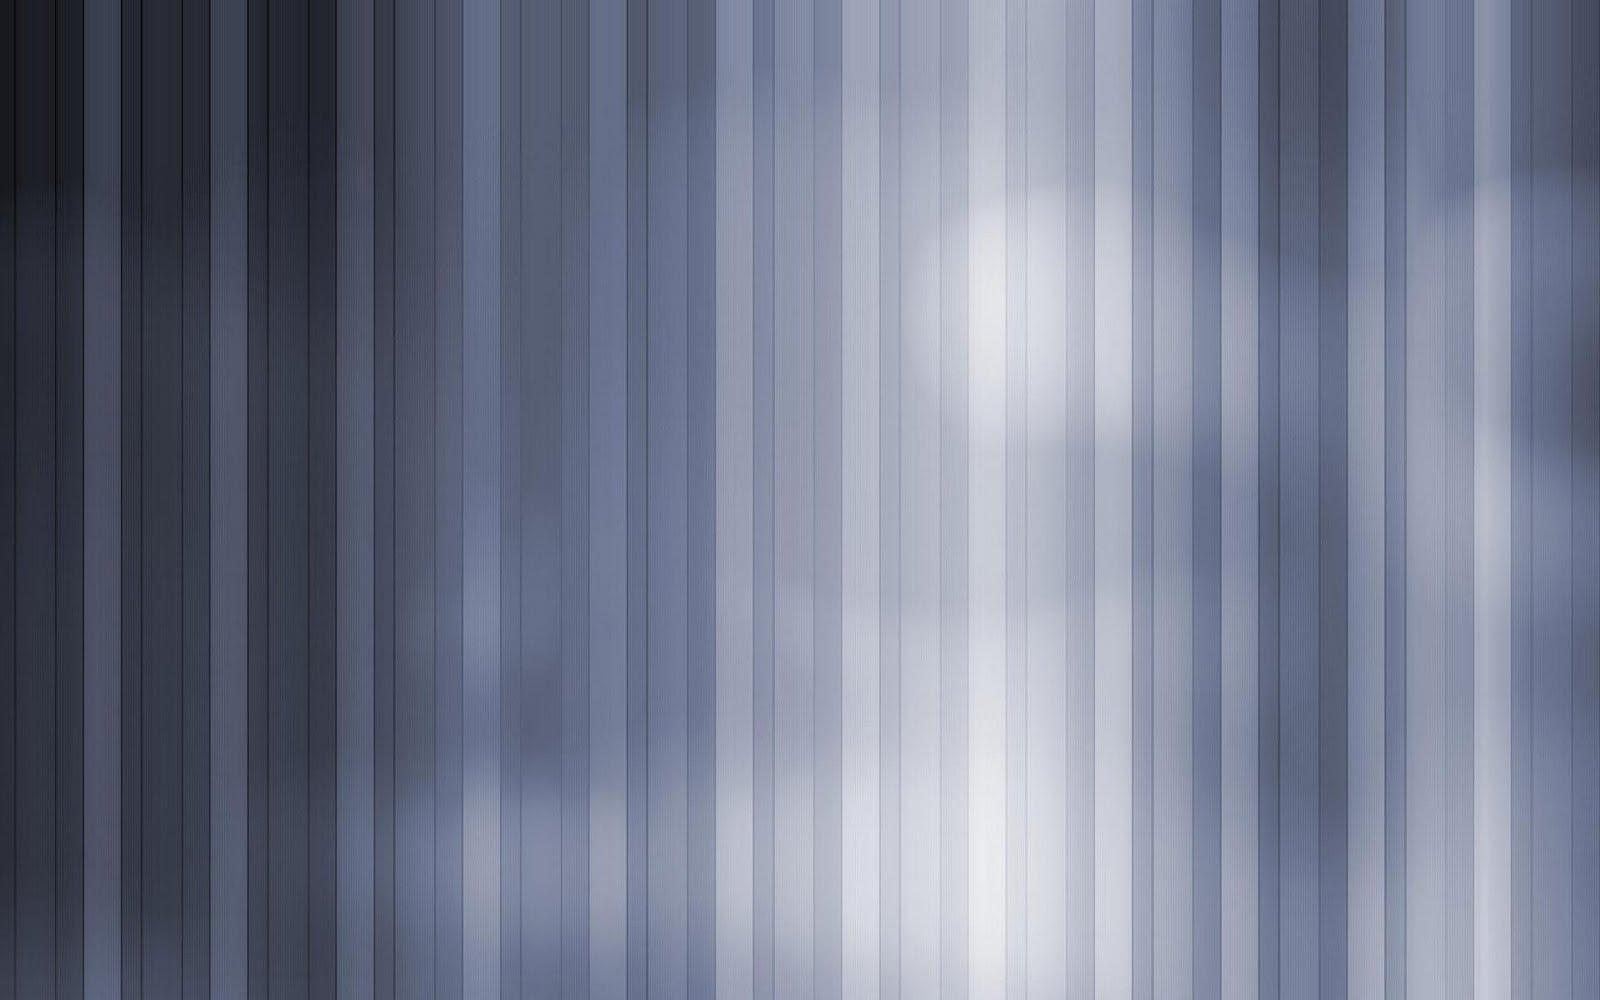 Best Top Desktop Abstract Pattern Wallpapers Hd Wallpaper Pattern 1600x1000